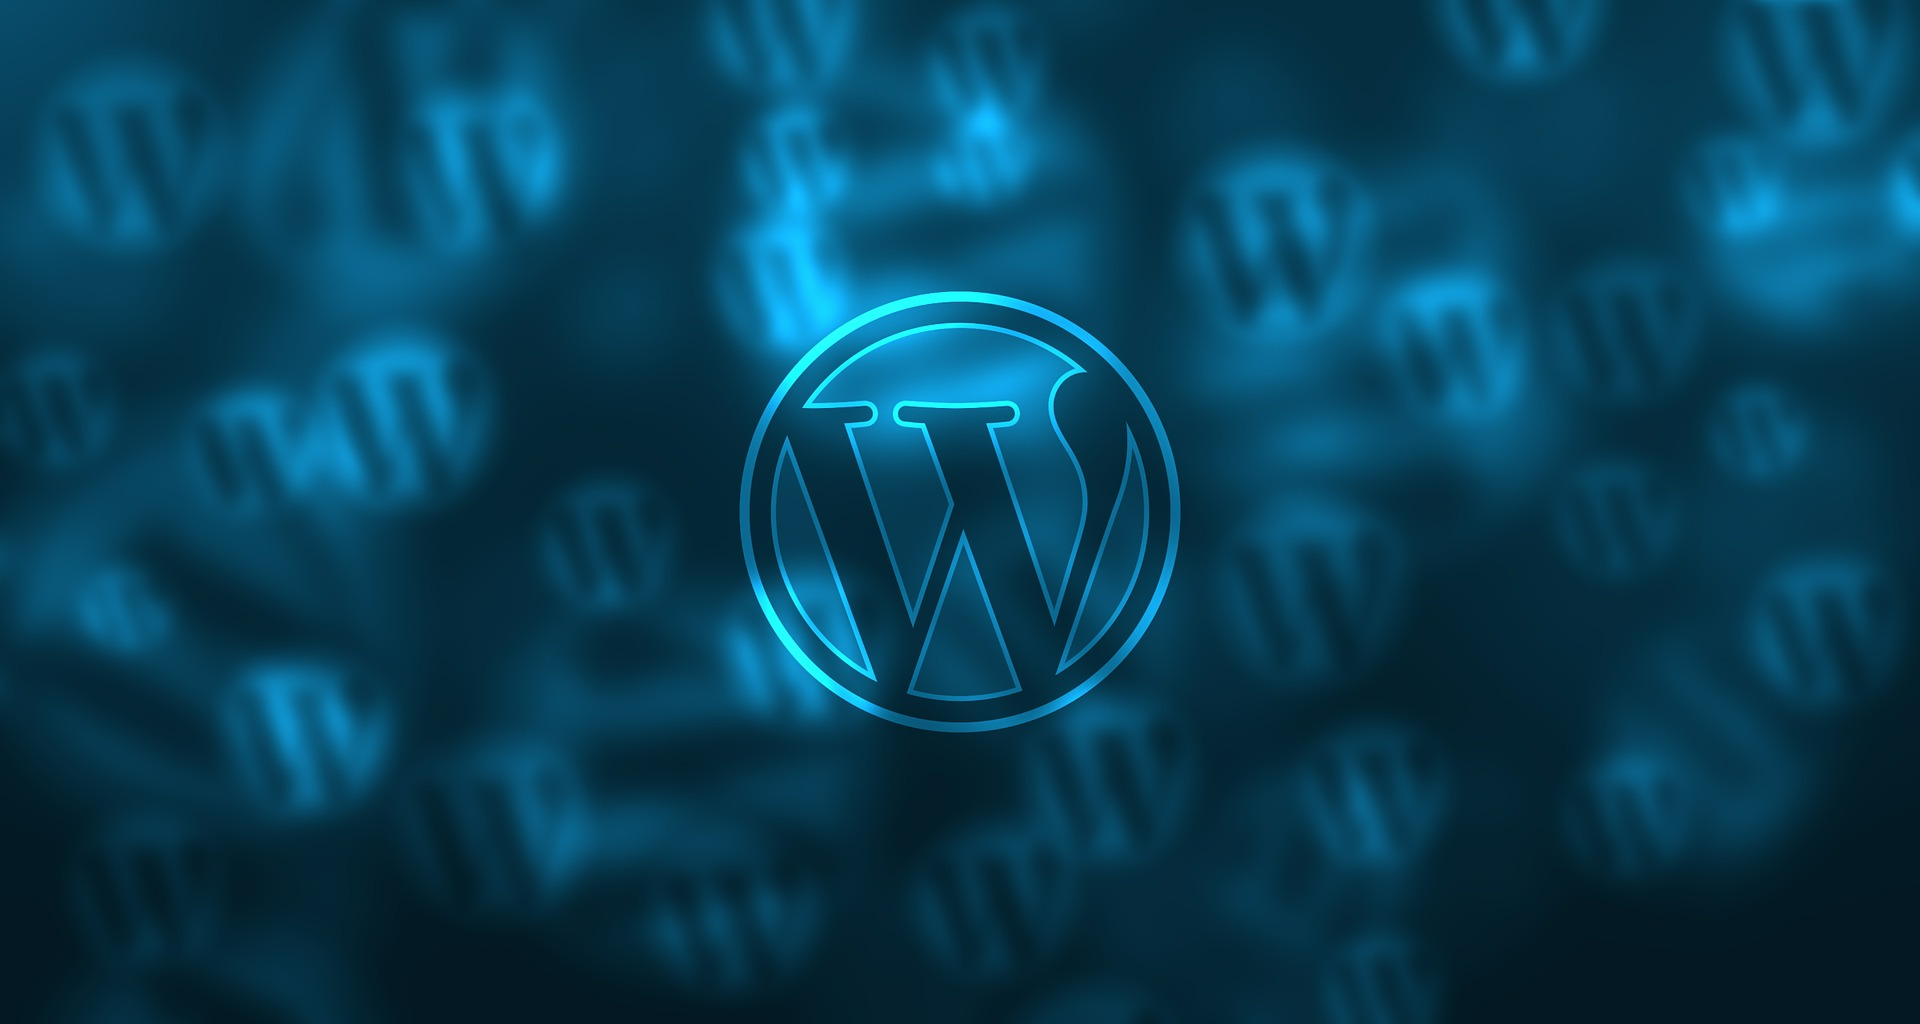 wordpress 581849 1920 - 絶対に知っておきたい!WordPressのテーマの使い方とは?